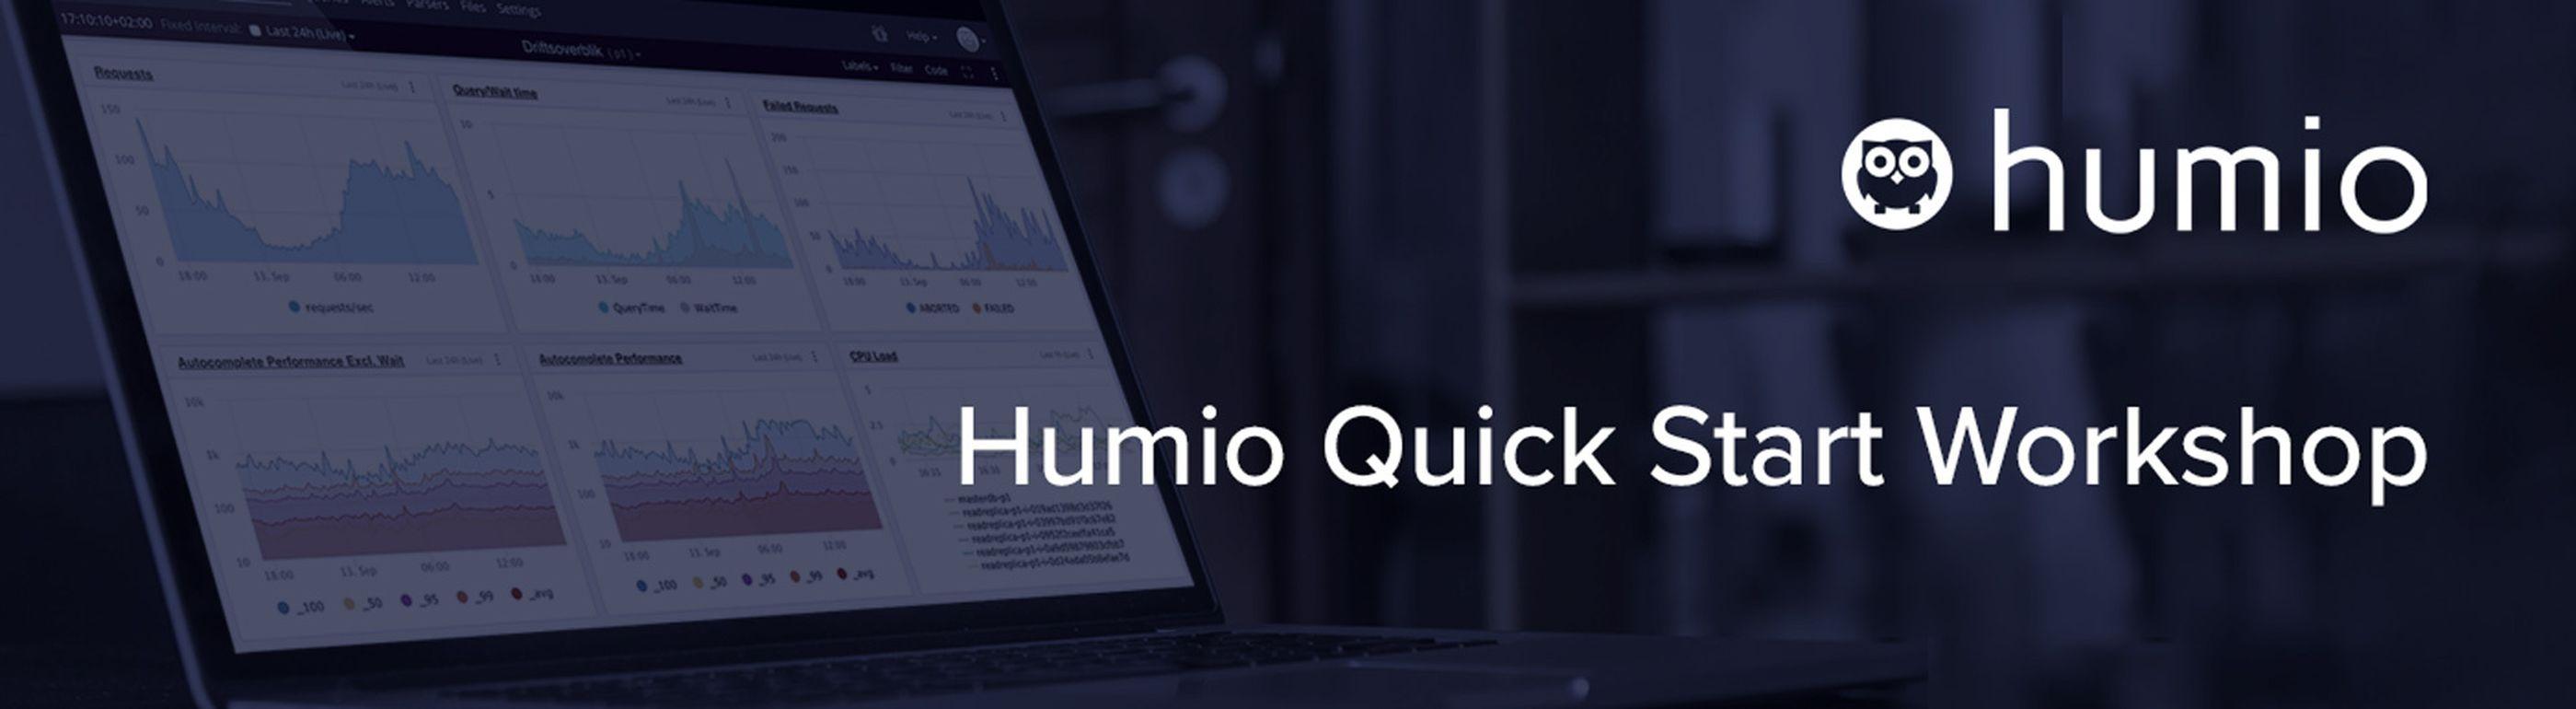 Humio Quick Start On-Demand